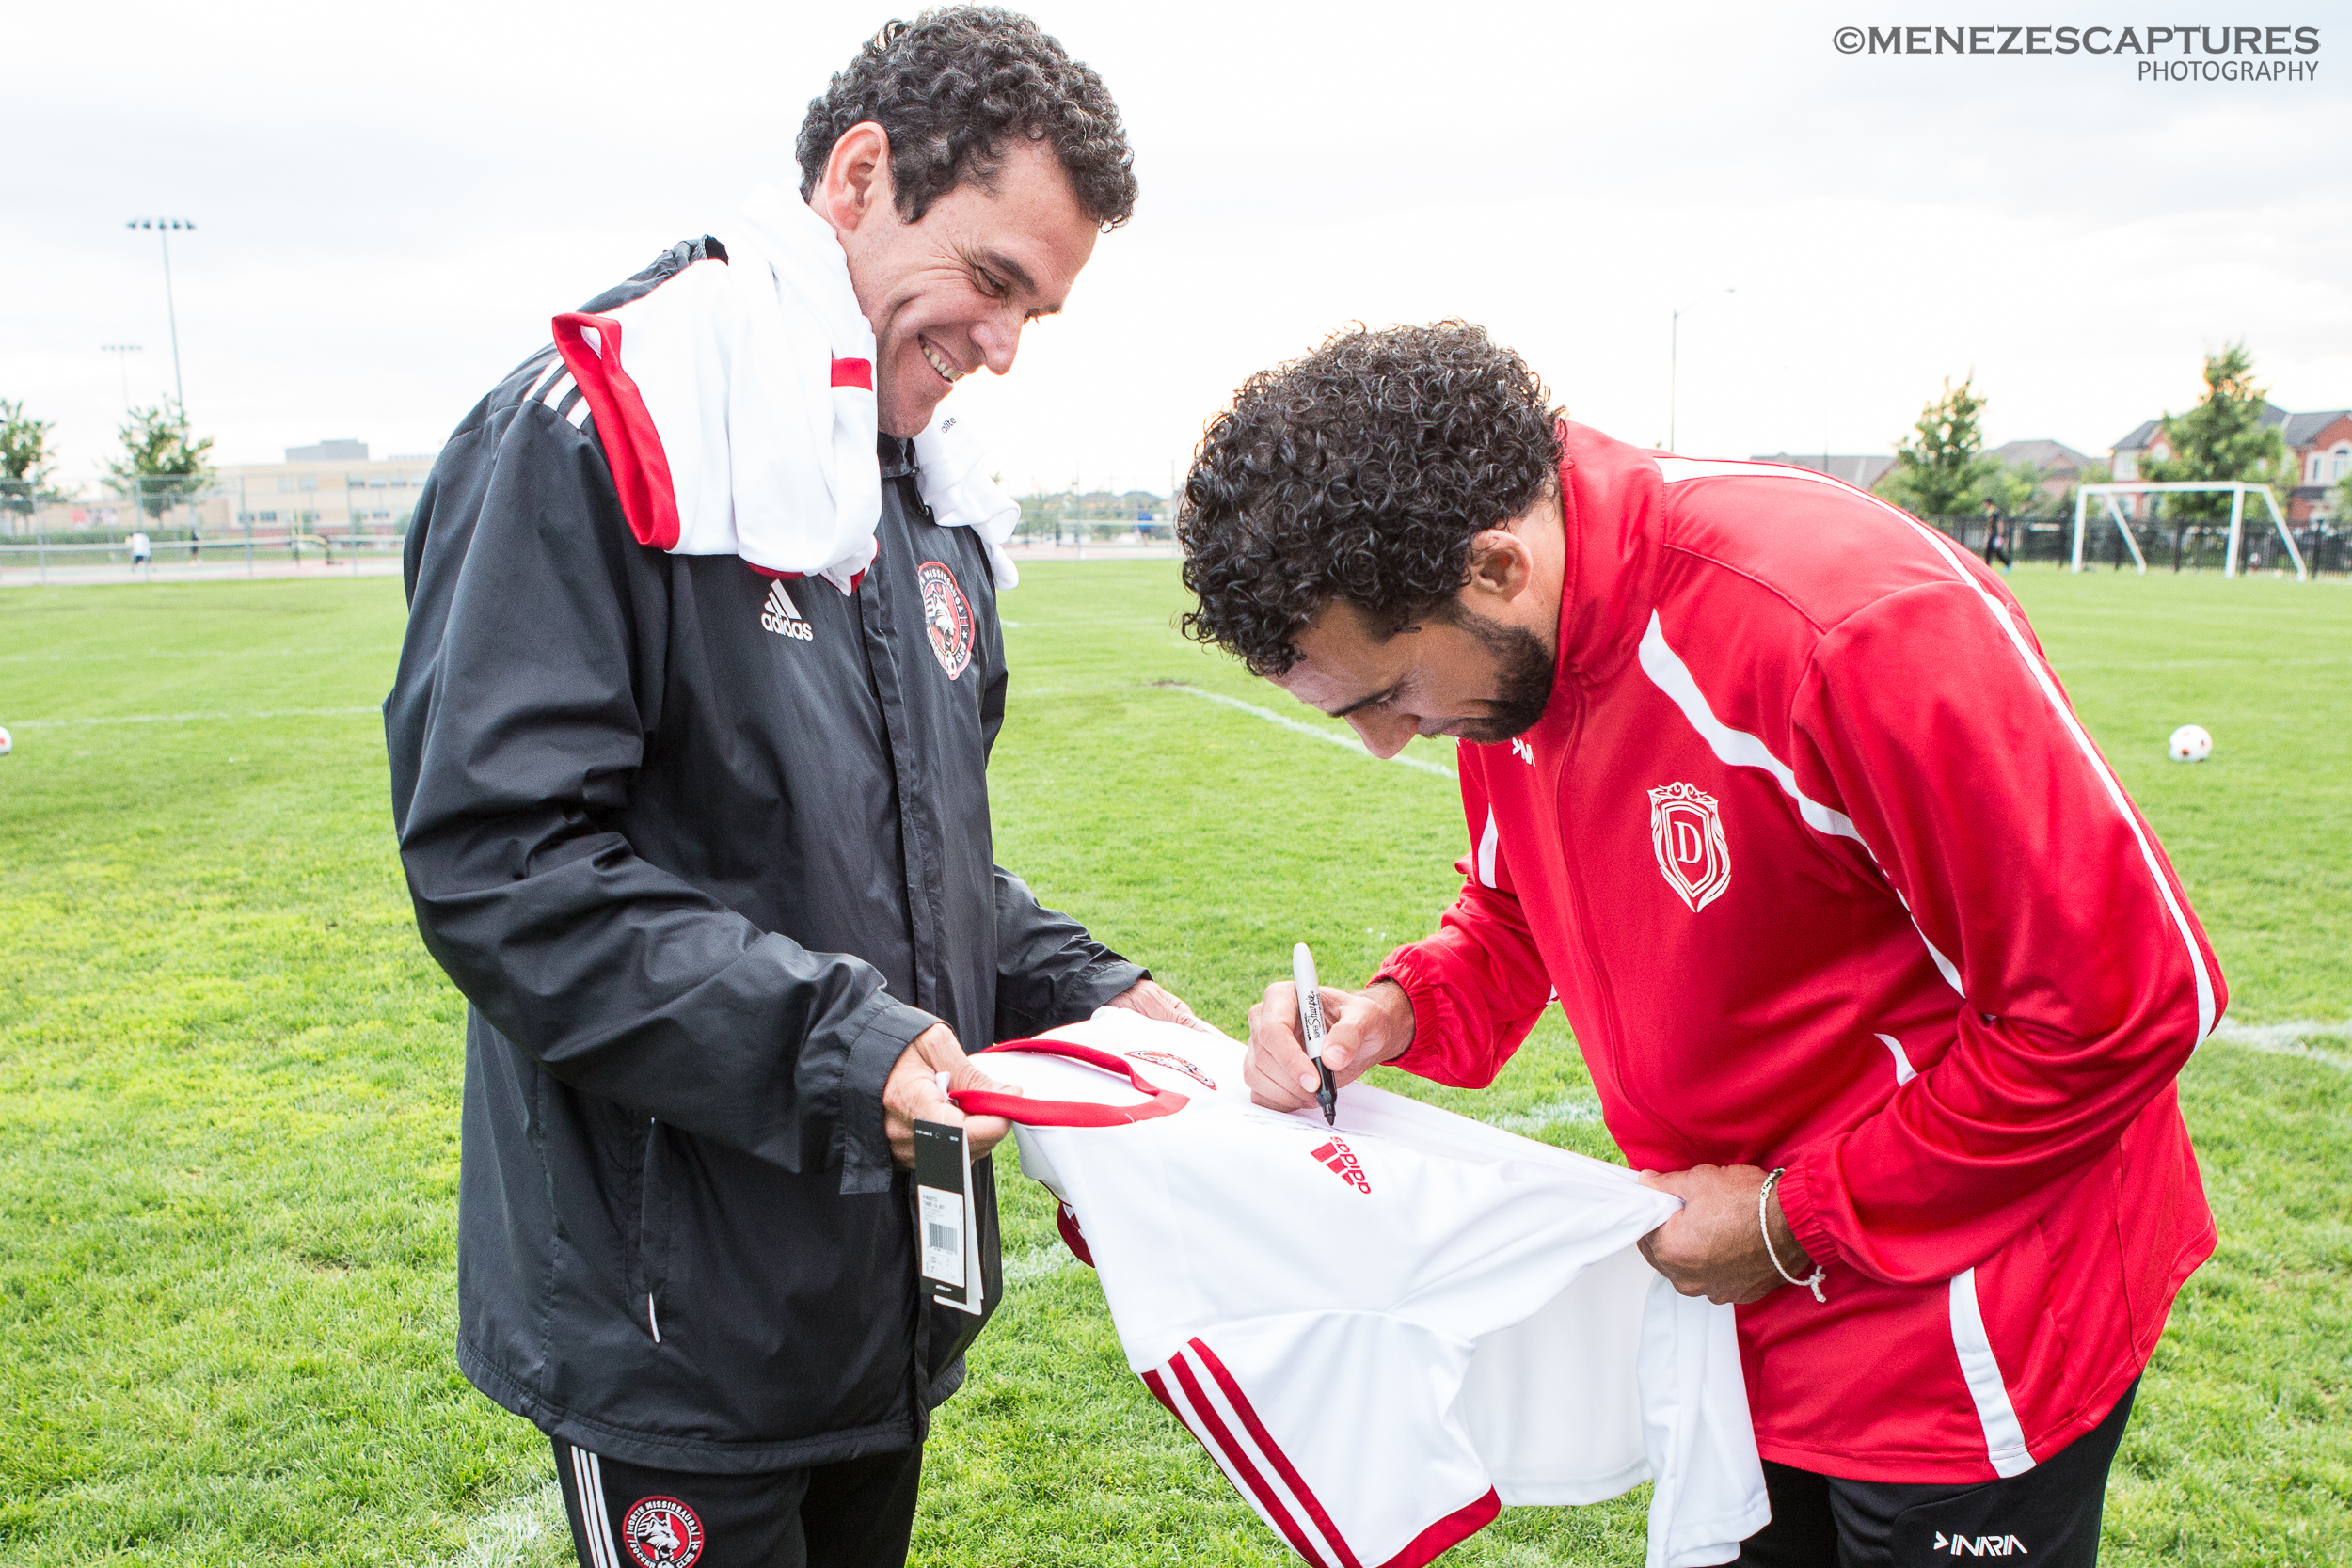 TFC football legend Dwayne De Nedro signs autographs at a NMSC training session (2016)